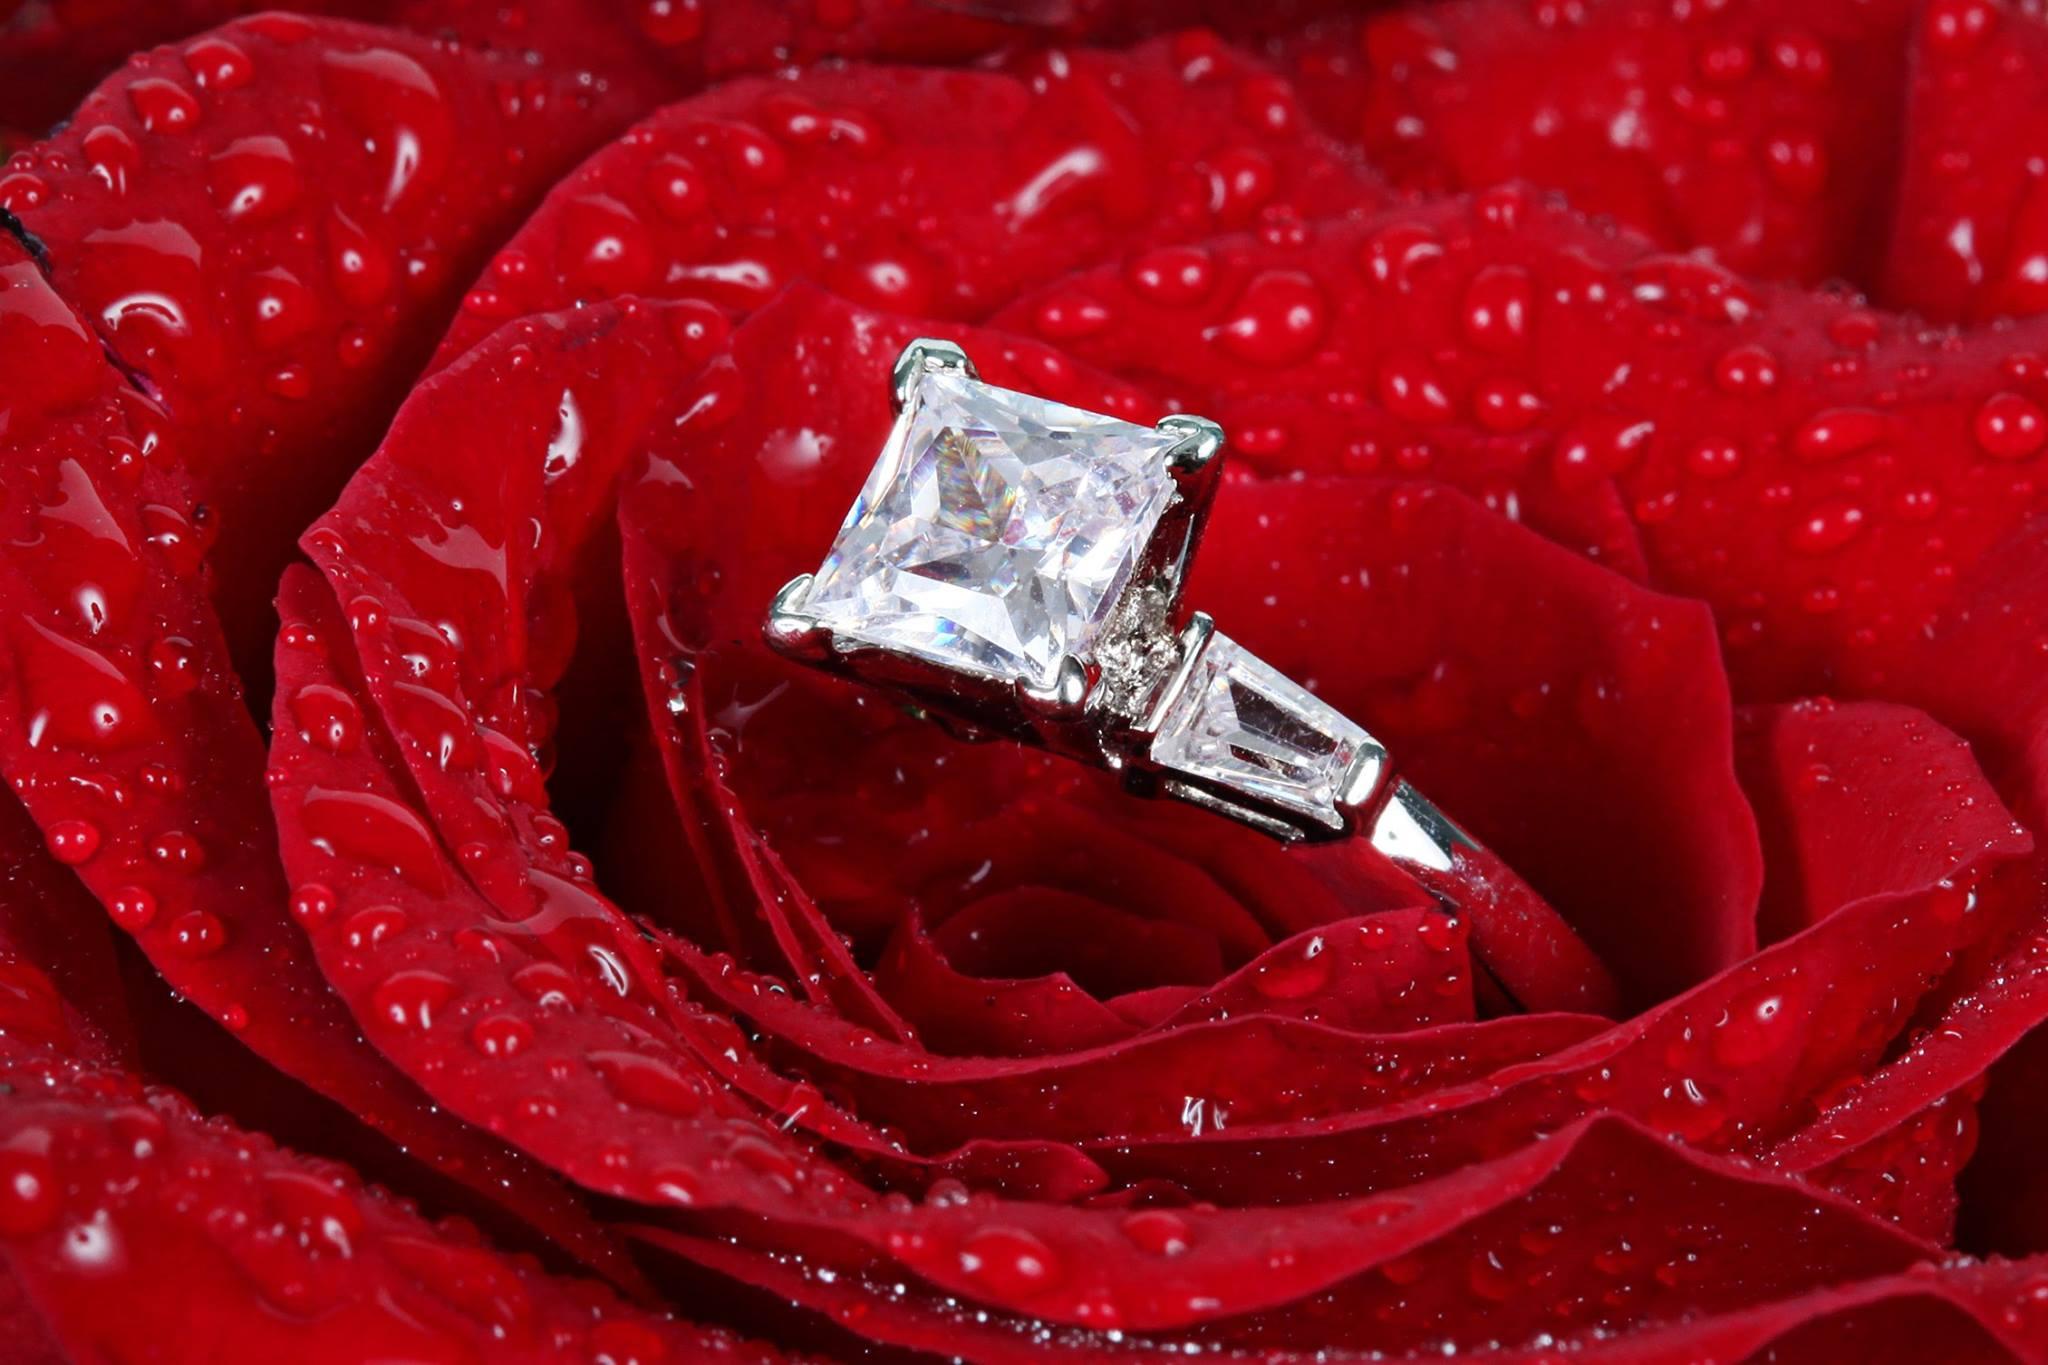 صور عريس وعروسه يوم الزفاف 11 صور عريس وعروسه يوم الزفاف